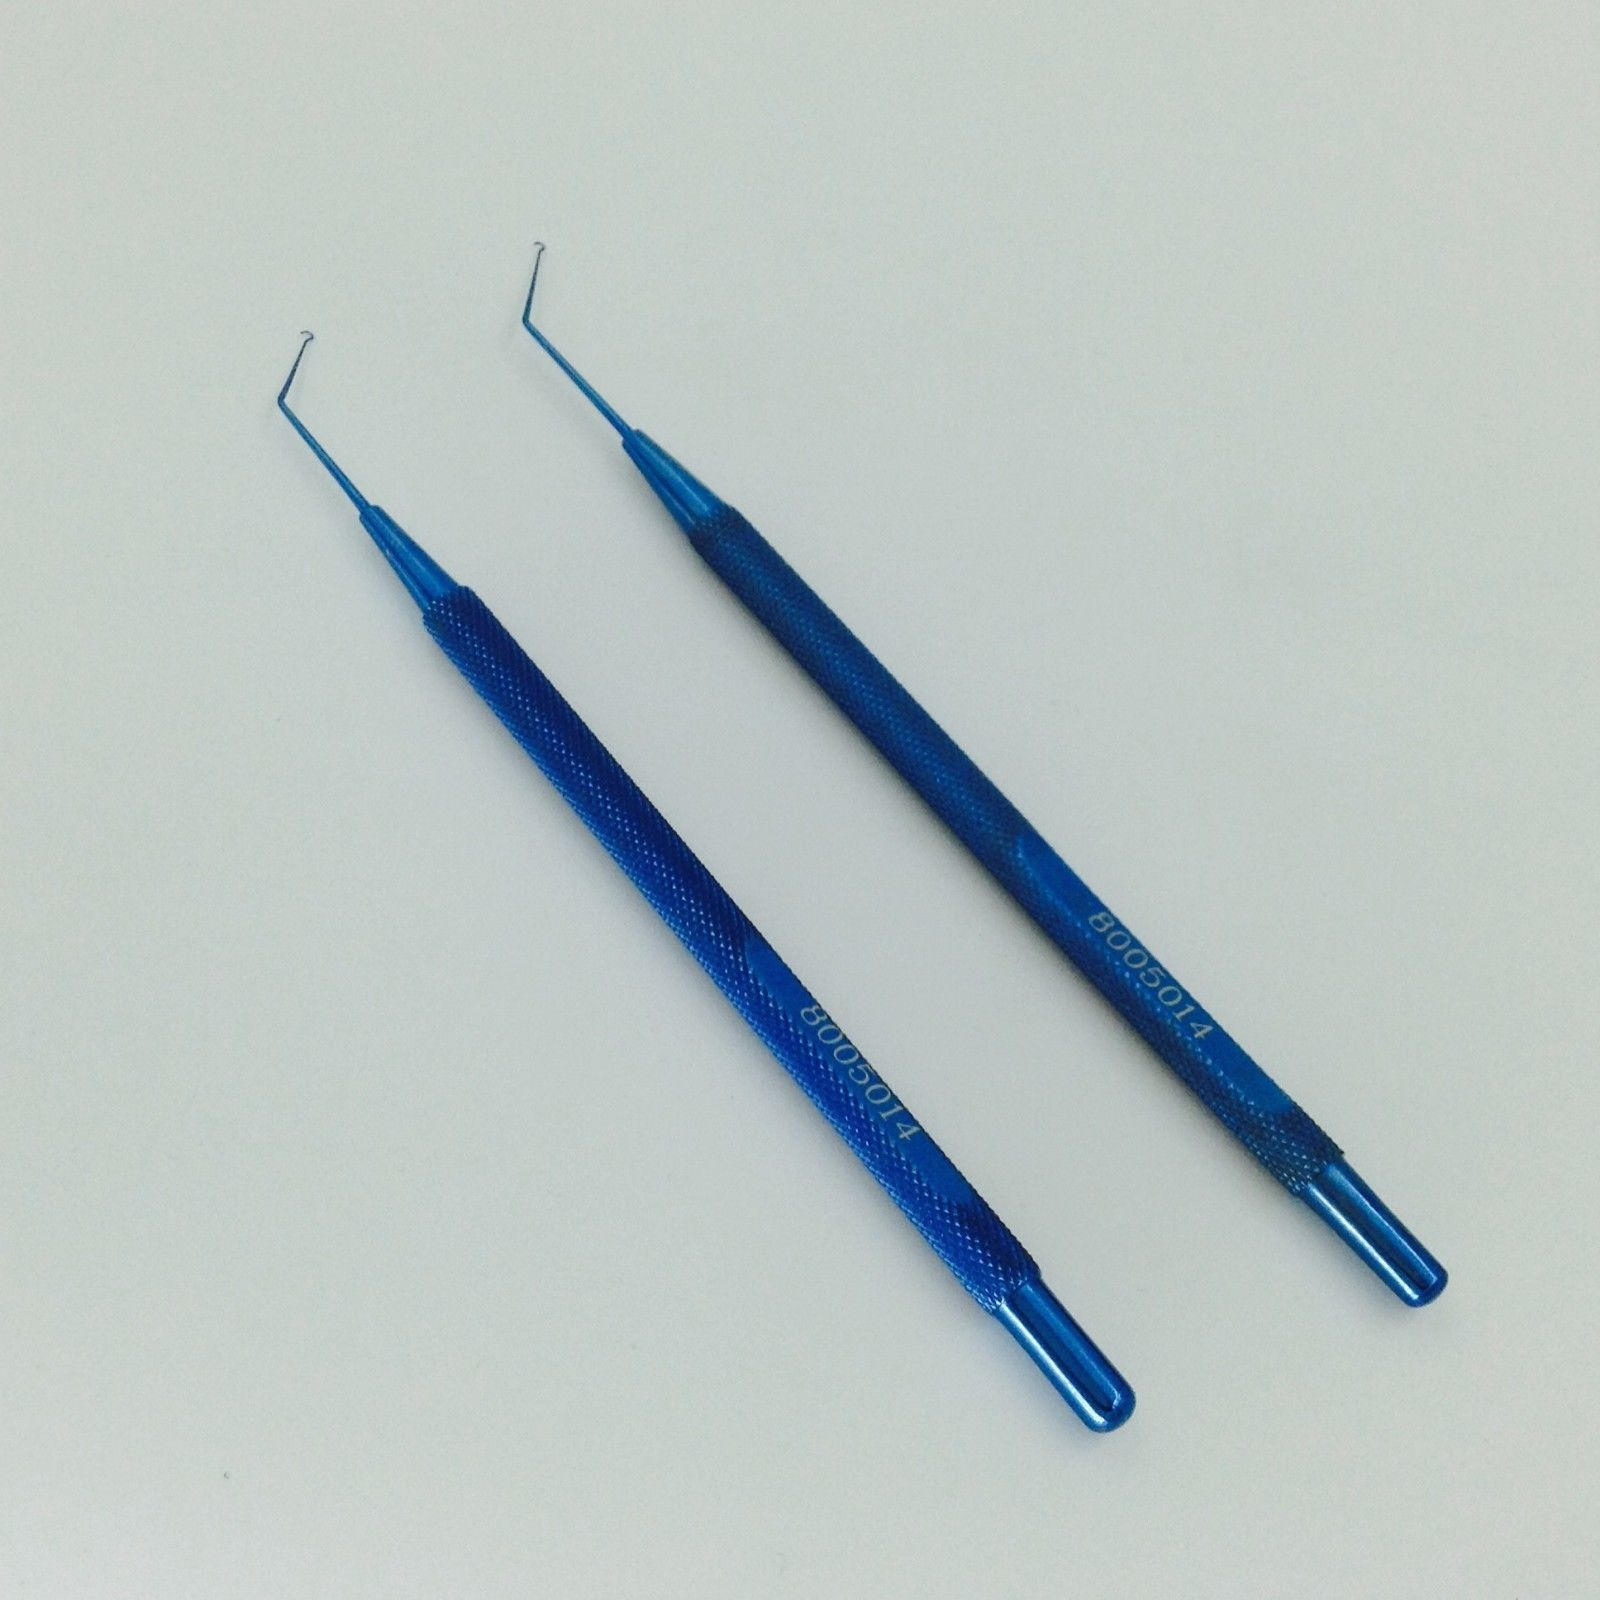 2 Pieces Best Titanium Jaffe-Knolle Iris Hook Ophthalmic Instrument